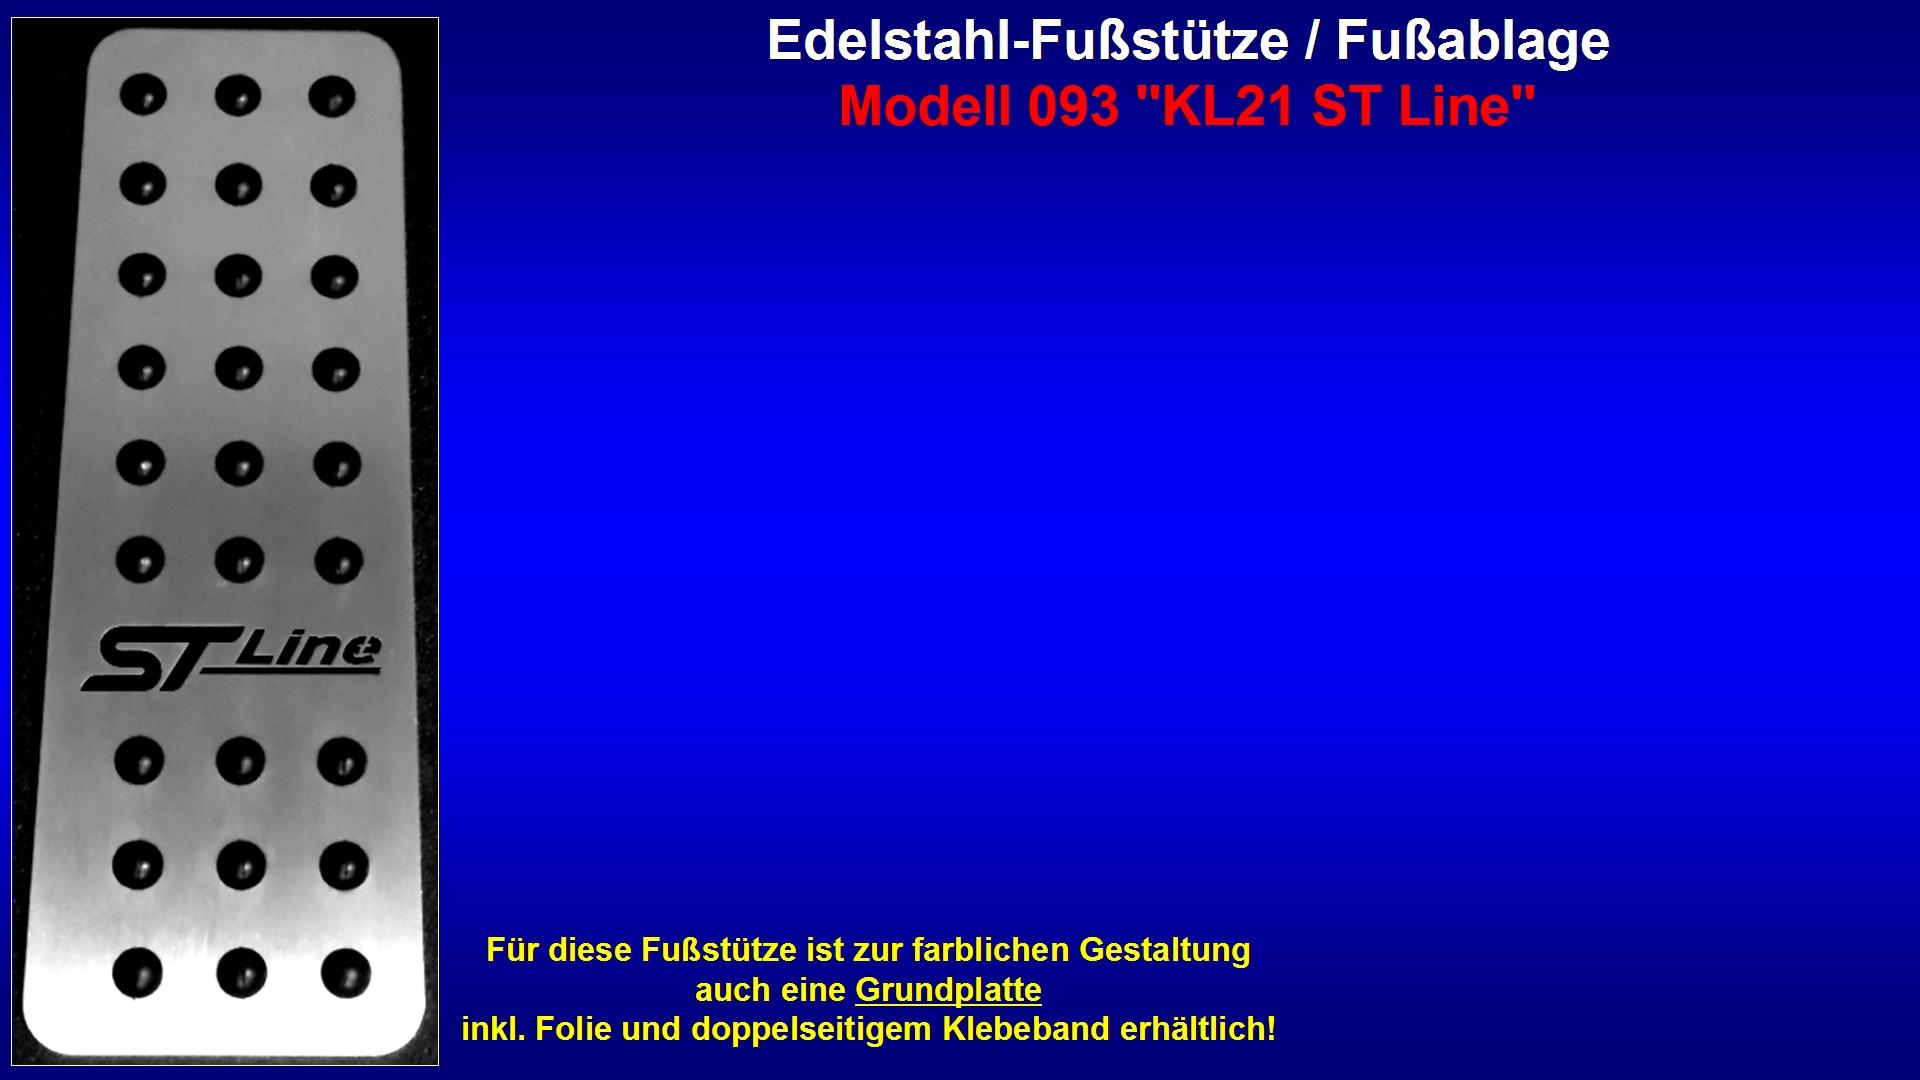 Präsentation Edelstahl-Fußstütze Modell 093 ''KL21 ST Line'' [ST-Line-Logo].jpg